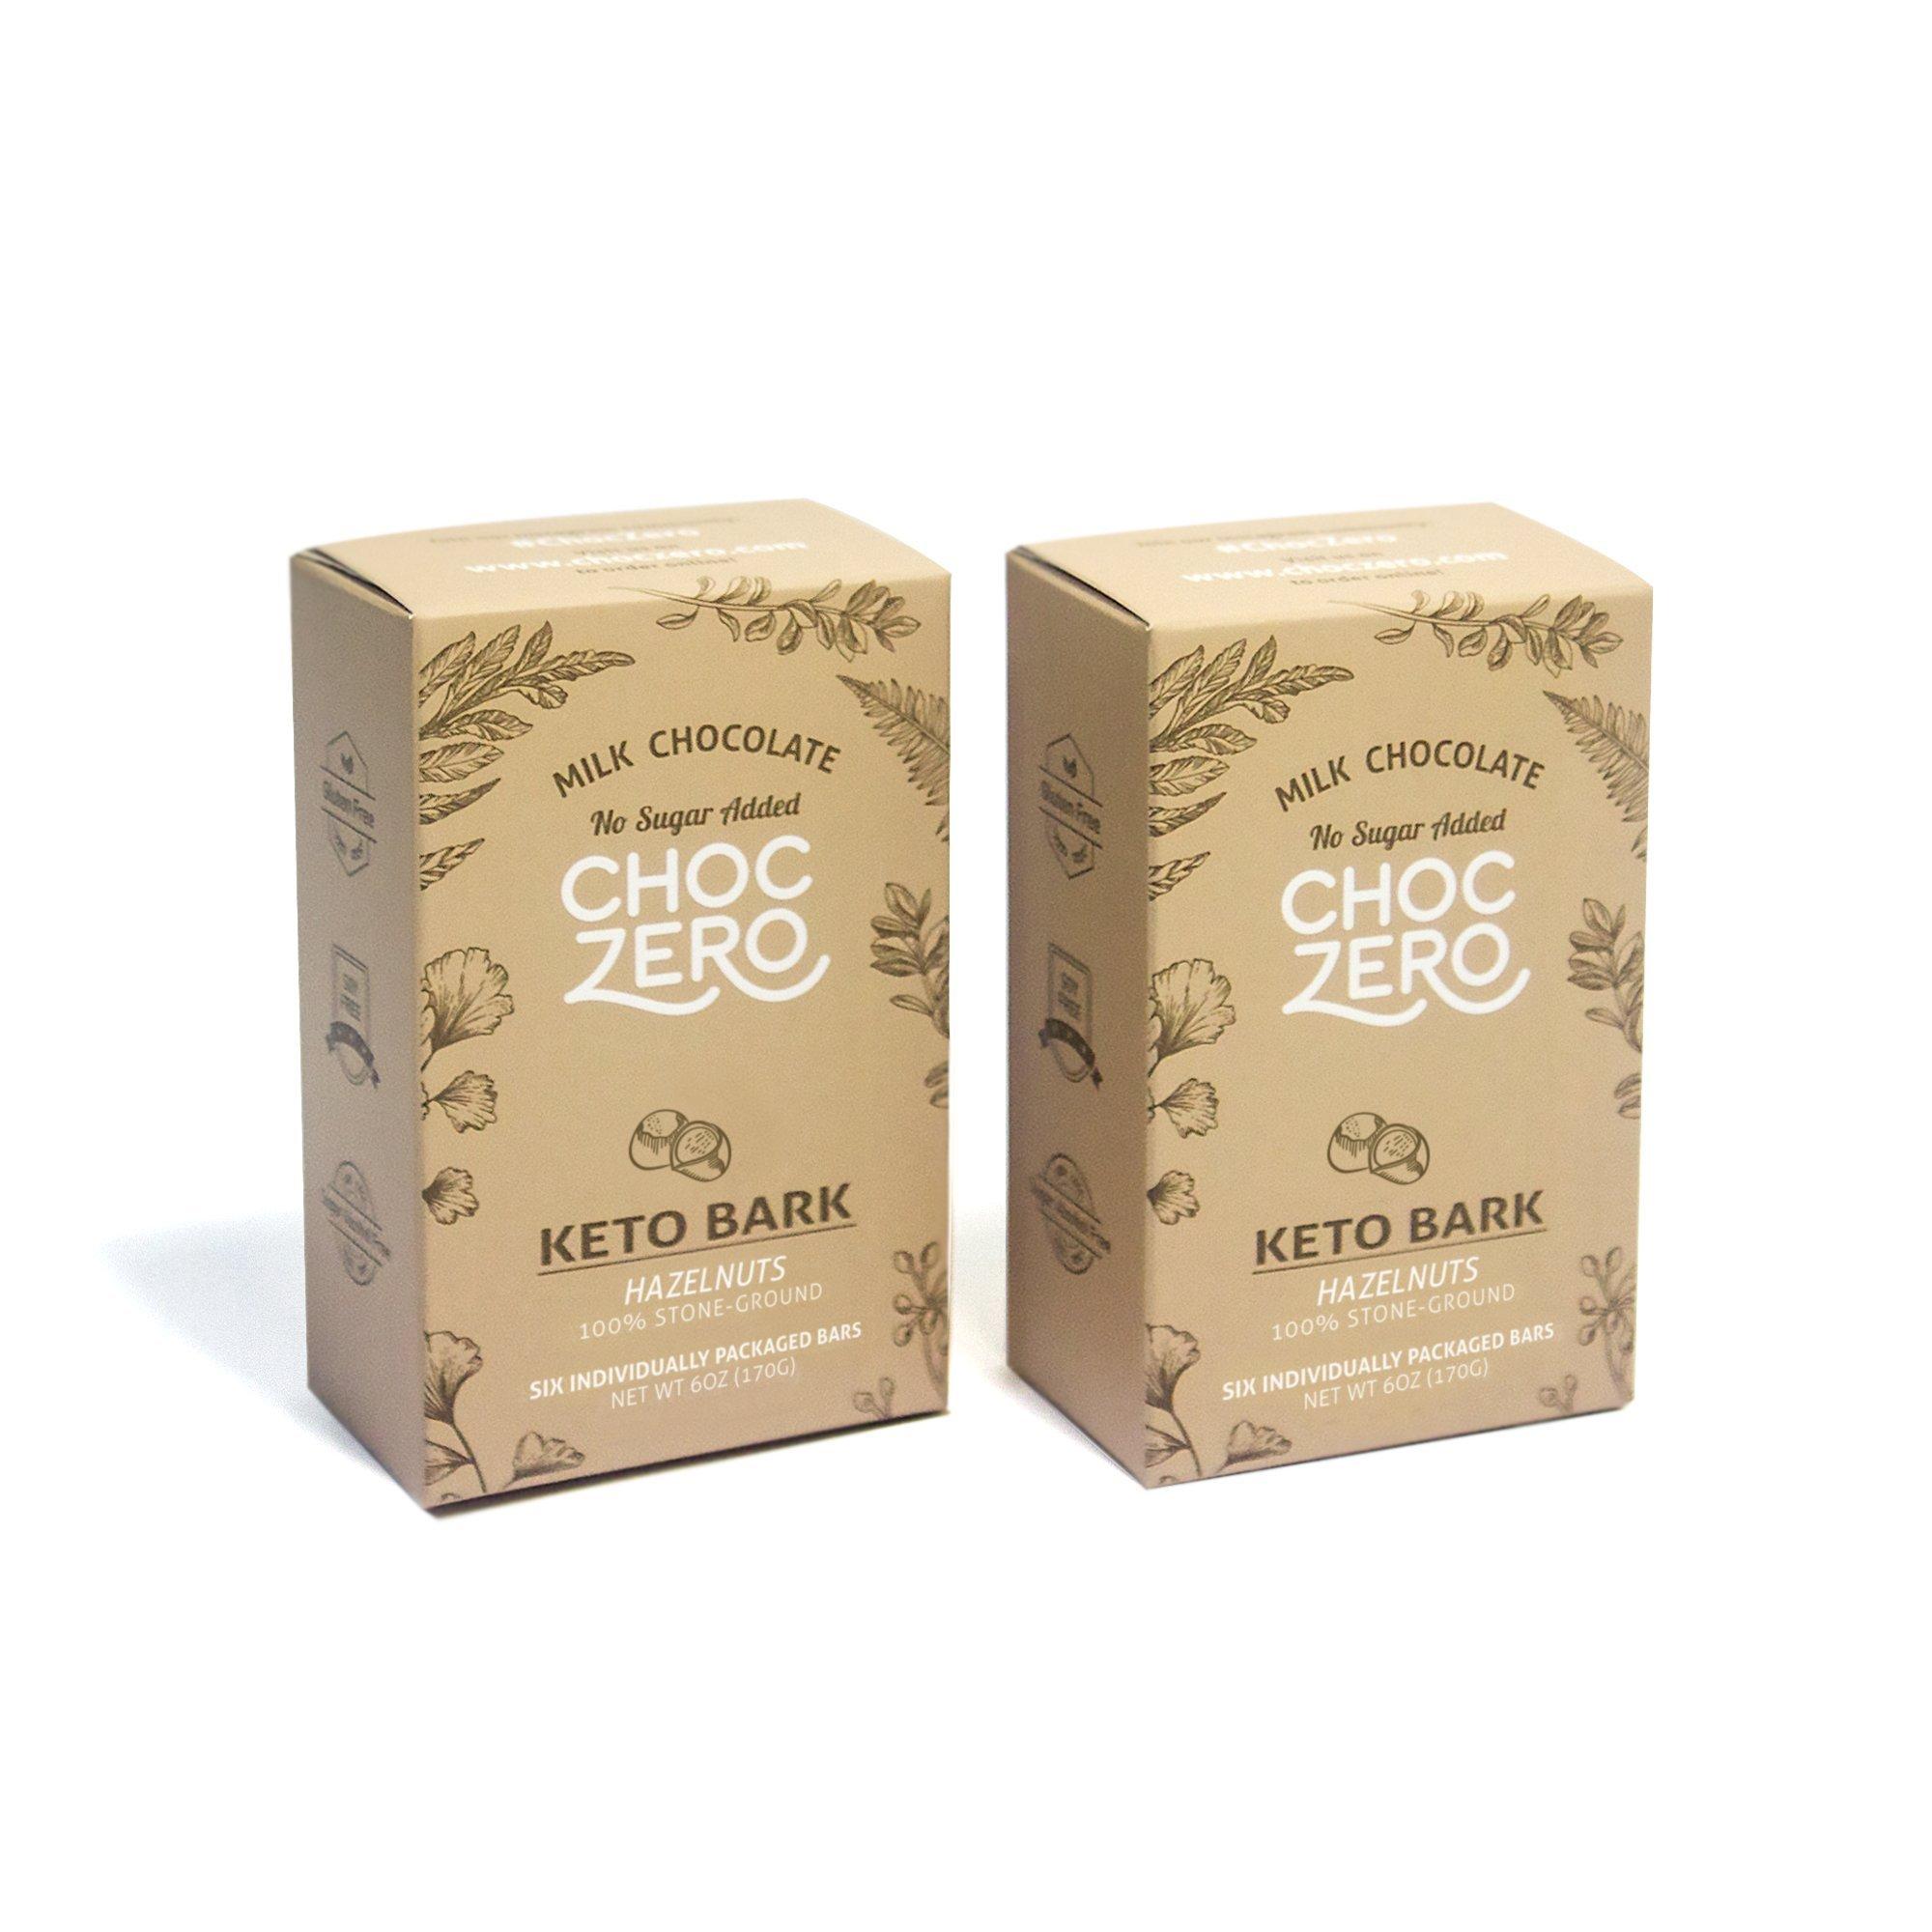 ChocZero Keto Bark, Milk Chocolate Hazelnuts, 100% Stone-Ground, No Added Sugar, Low Carb, No Sugar Alcohols, Non-GMO (2 boxes, 6 bars/each)